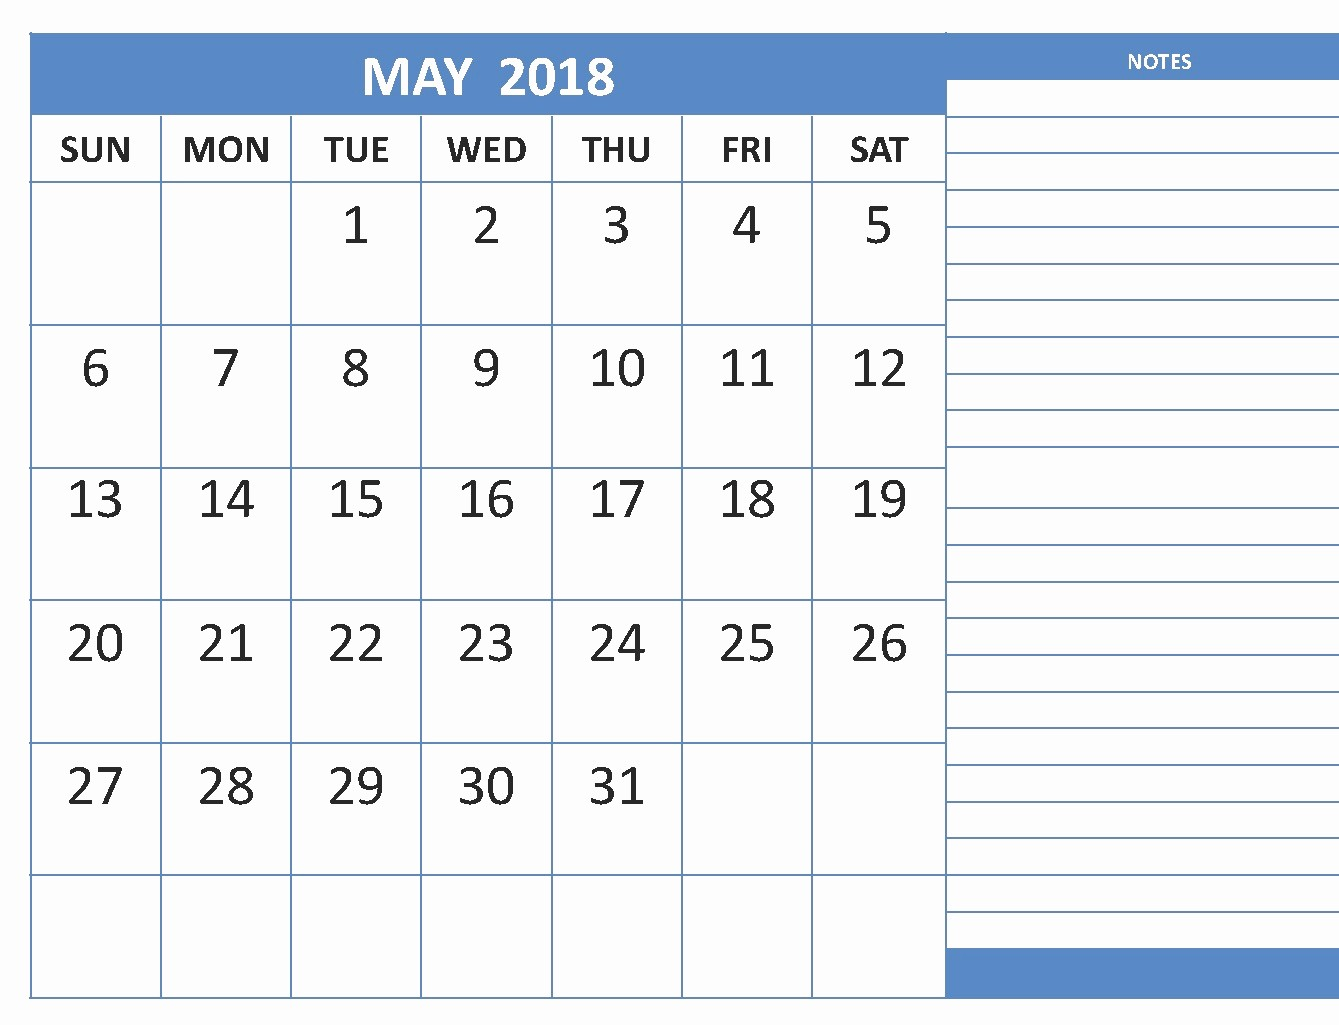 Free May 2018 Calendar Template Lovely Editable May 2018 Calendar